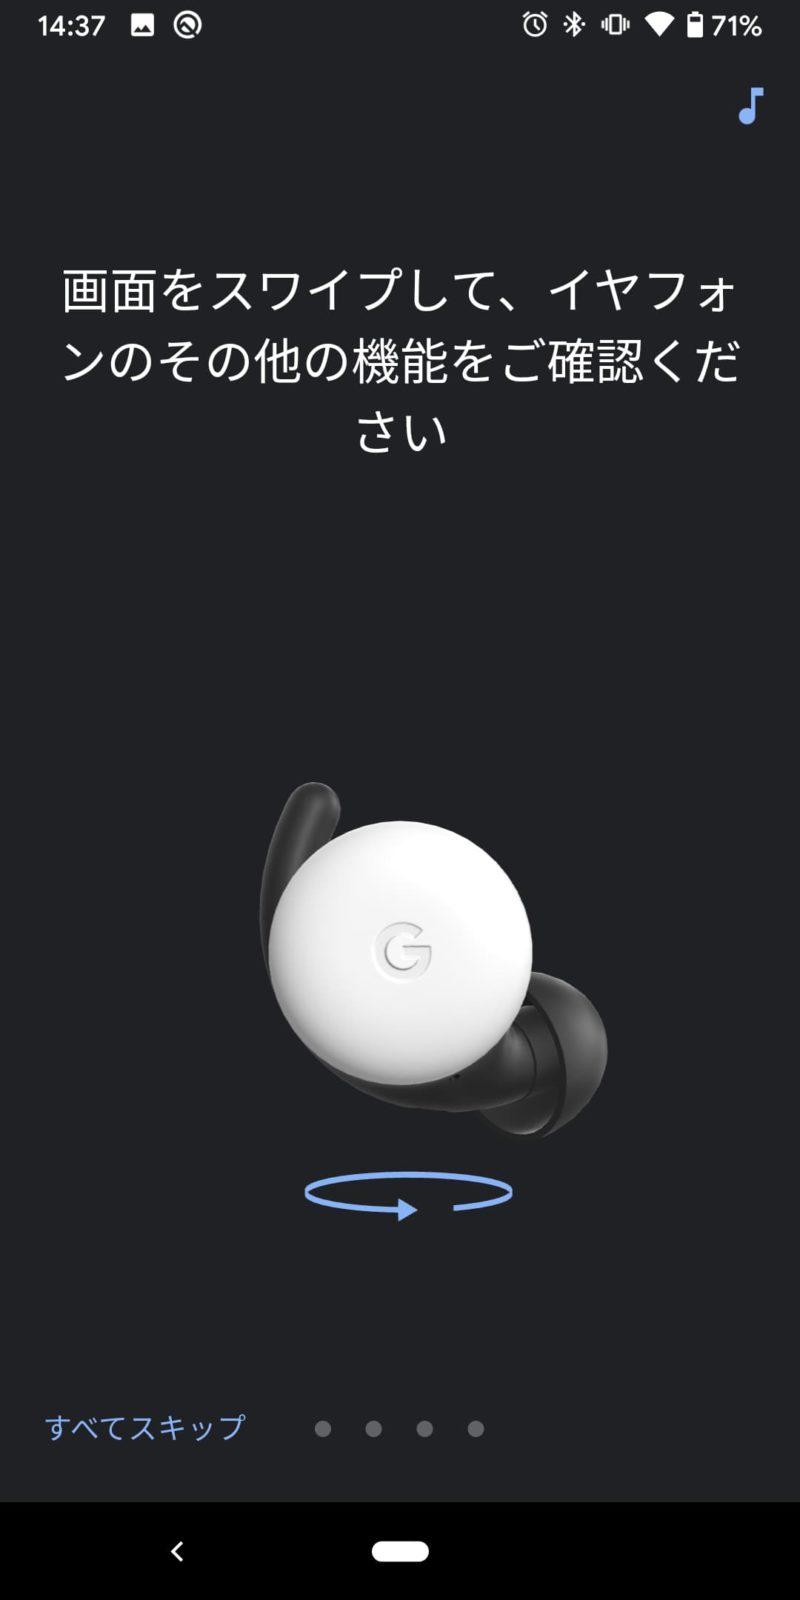 Screenshot 20200514 143749 800x1600-「Google Pixel Buds (2020)」を実機レビュー。完全ワイヤレスになって満足だけど、機能面は物足りないかも